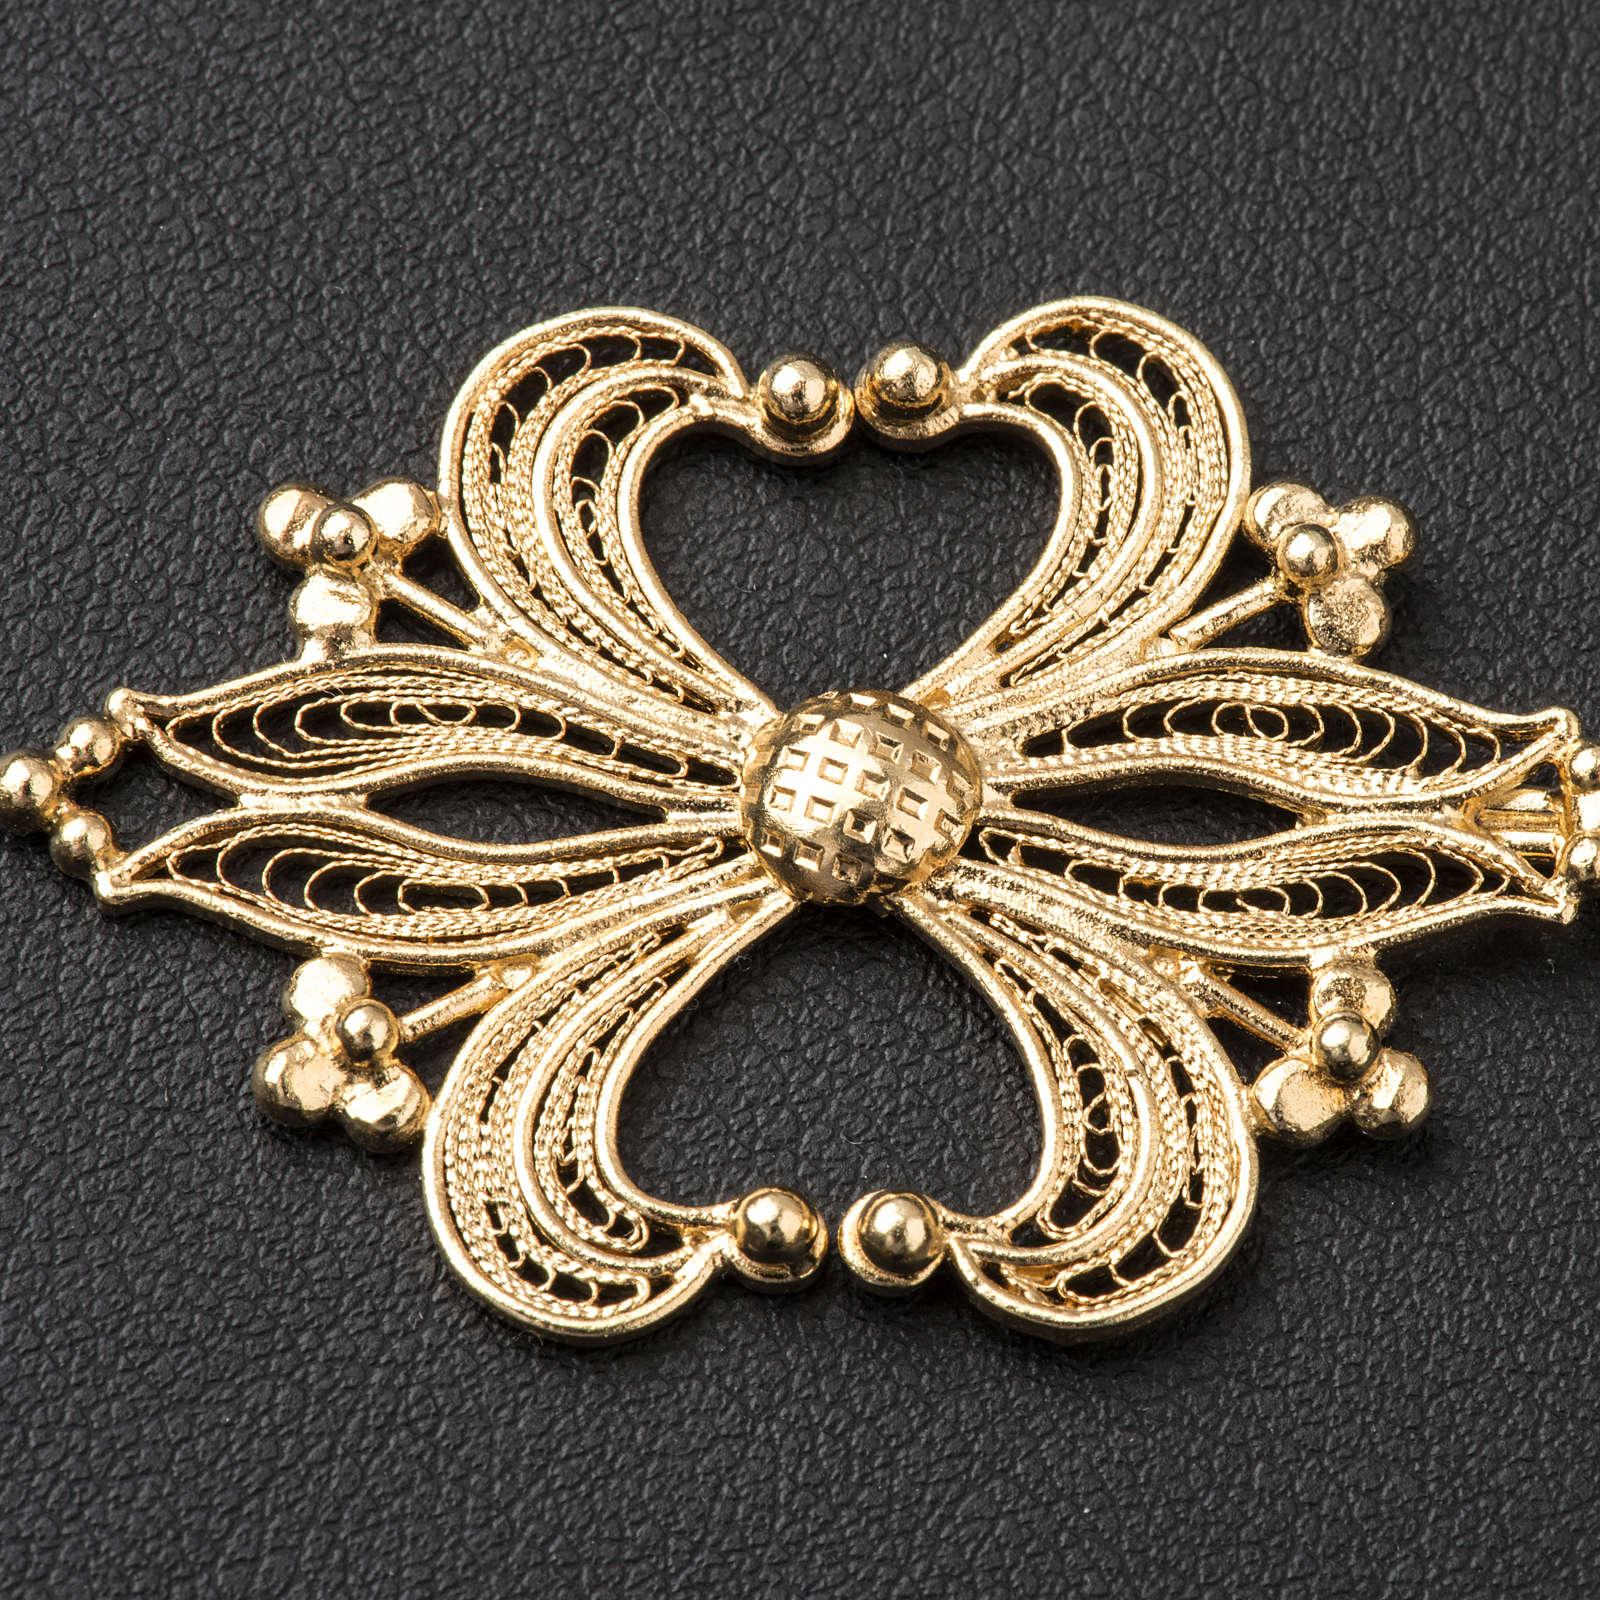 Cope Clasp in golden silver 800 filigree 4